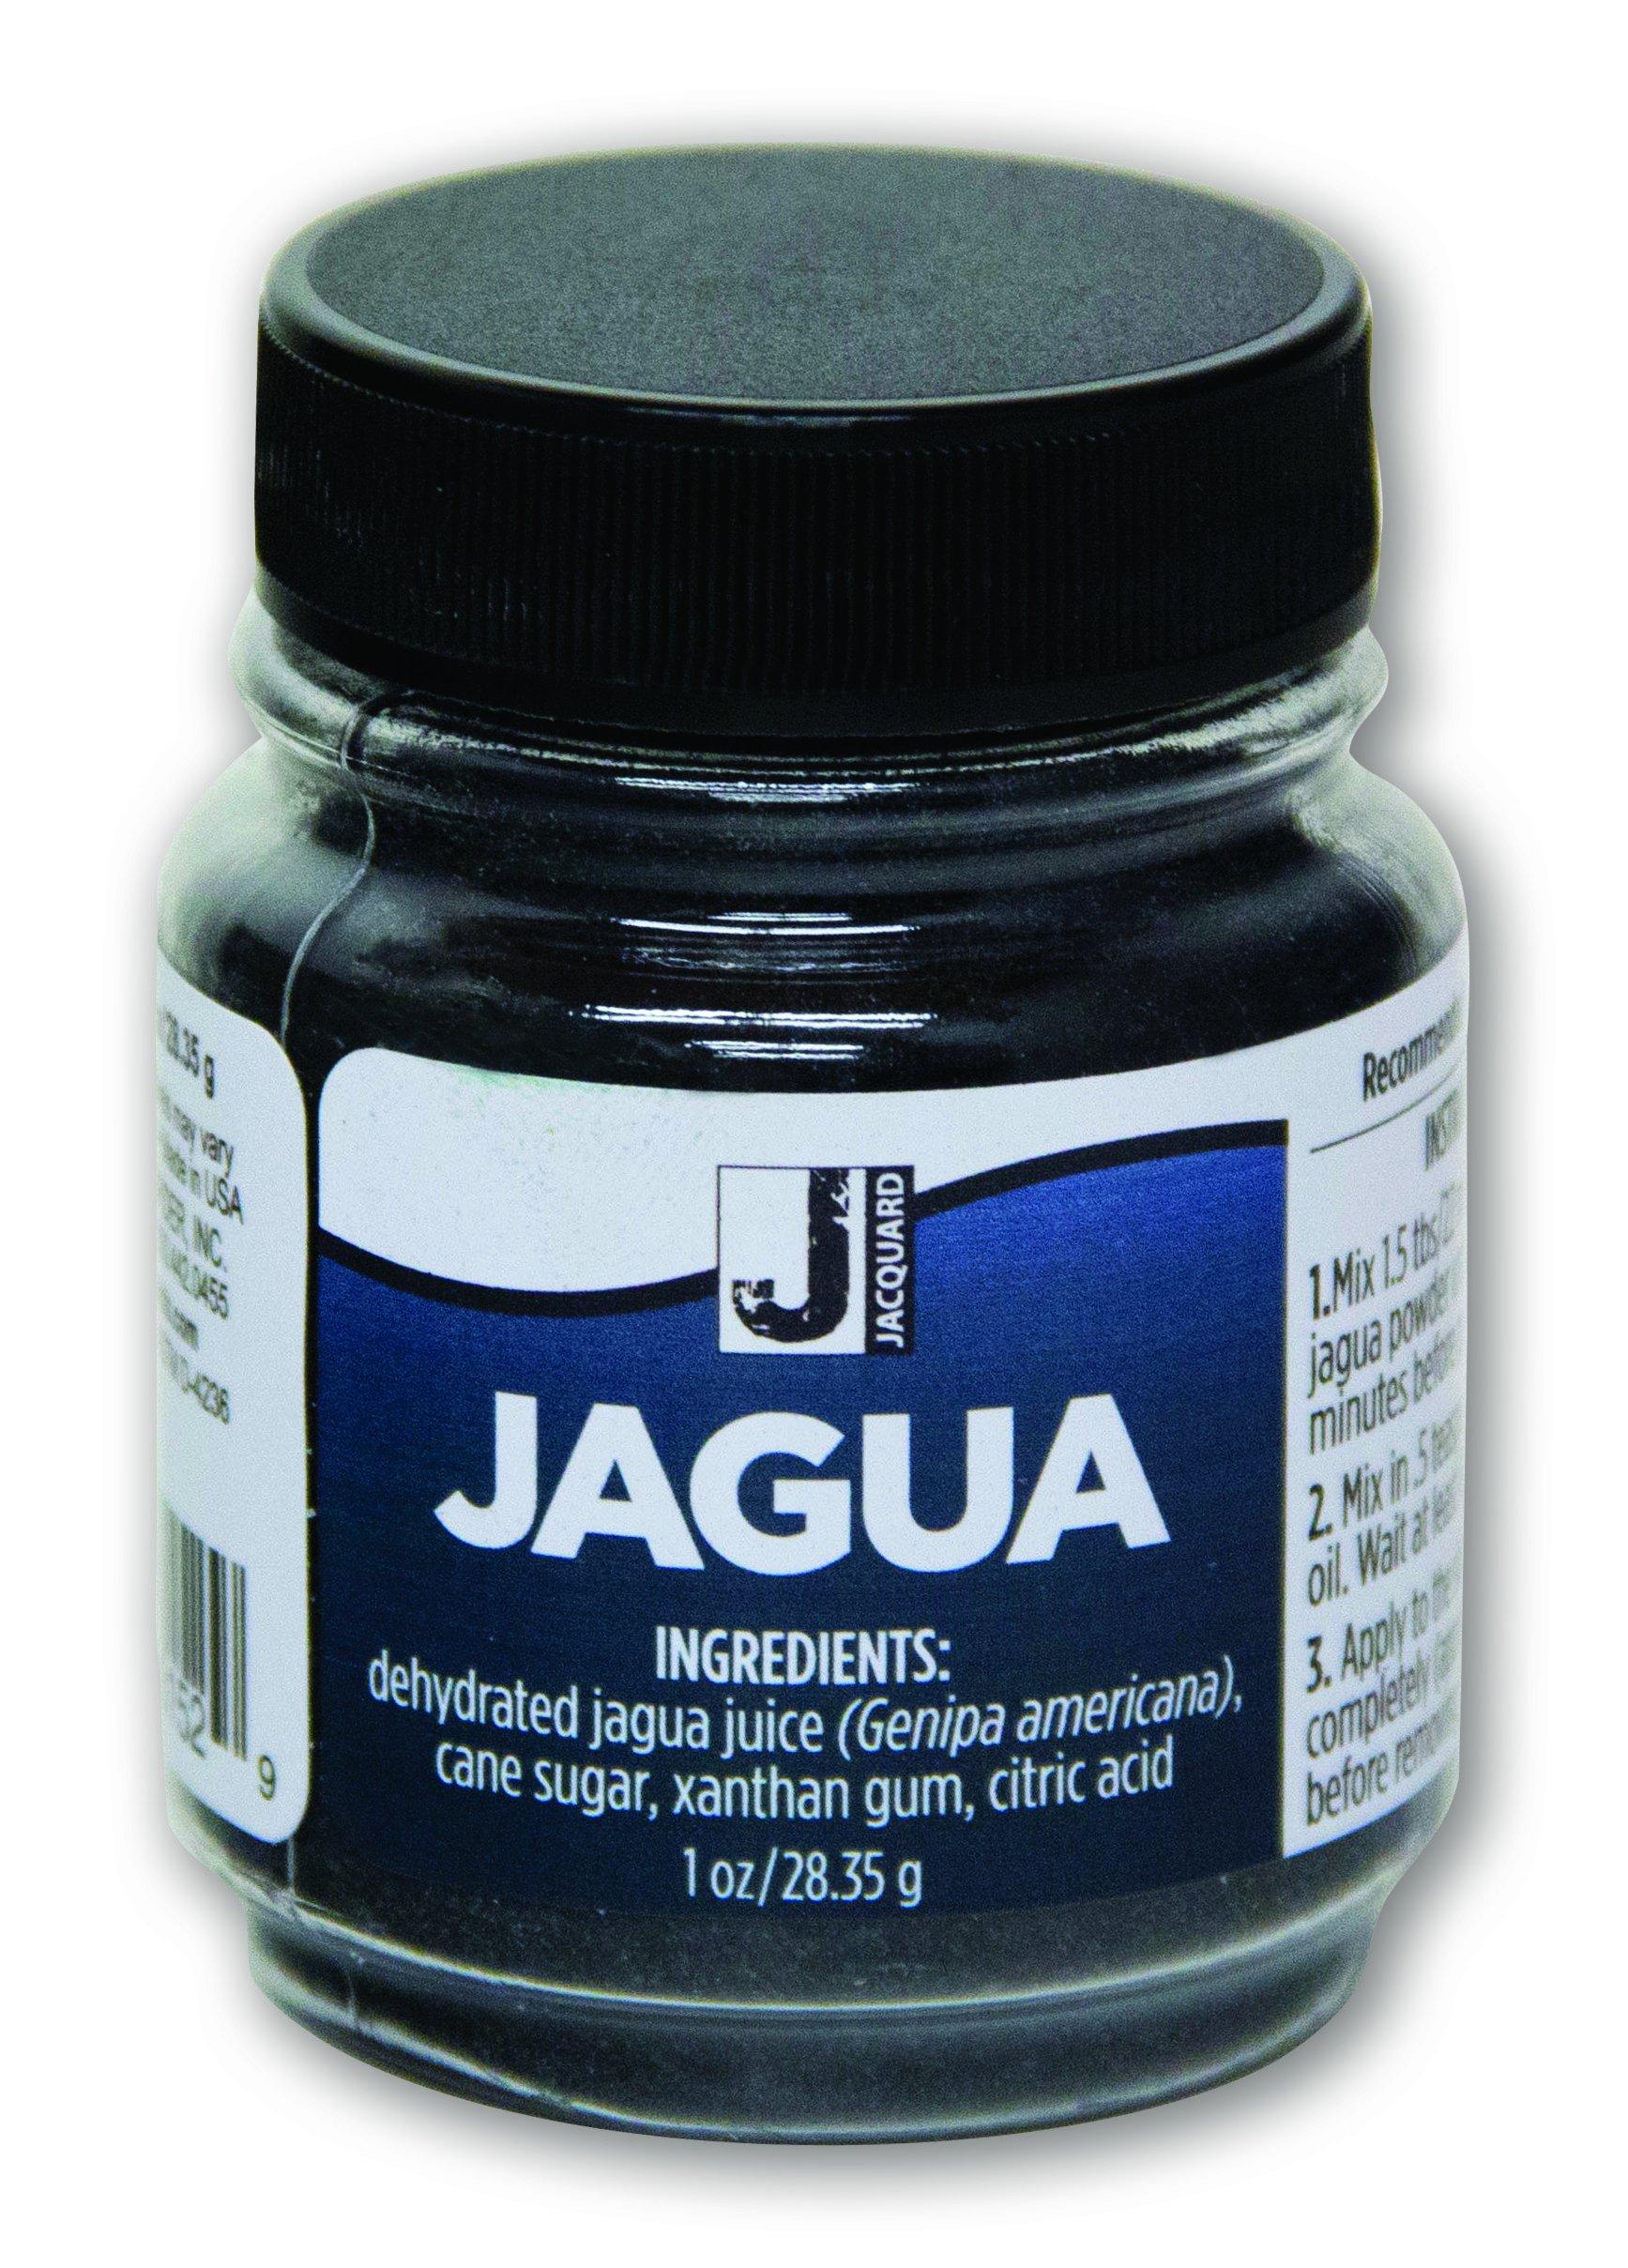 Jacquard Jagua Powder, 1 1, 1 Oz by Jacquard